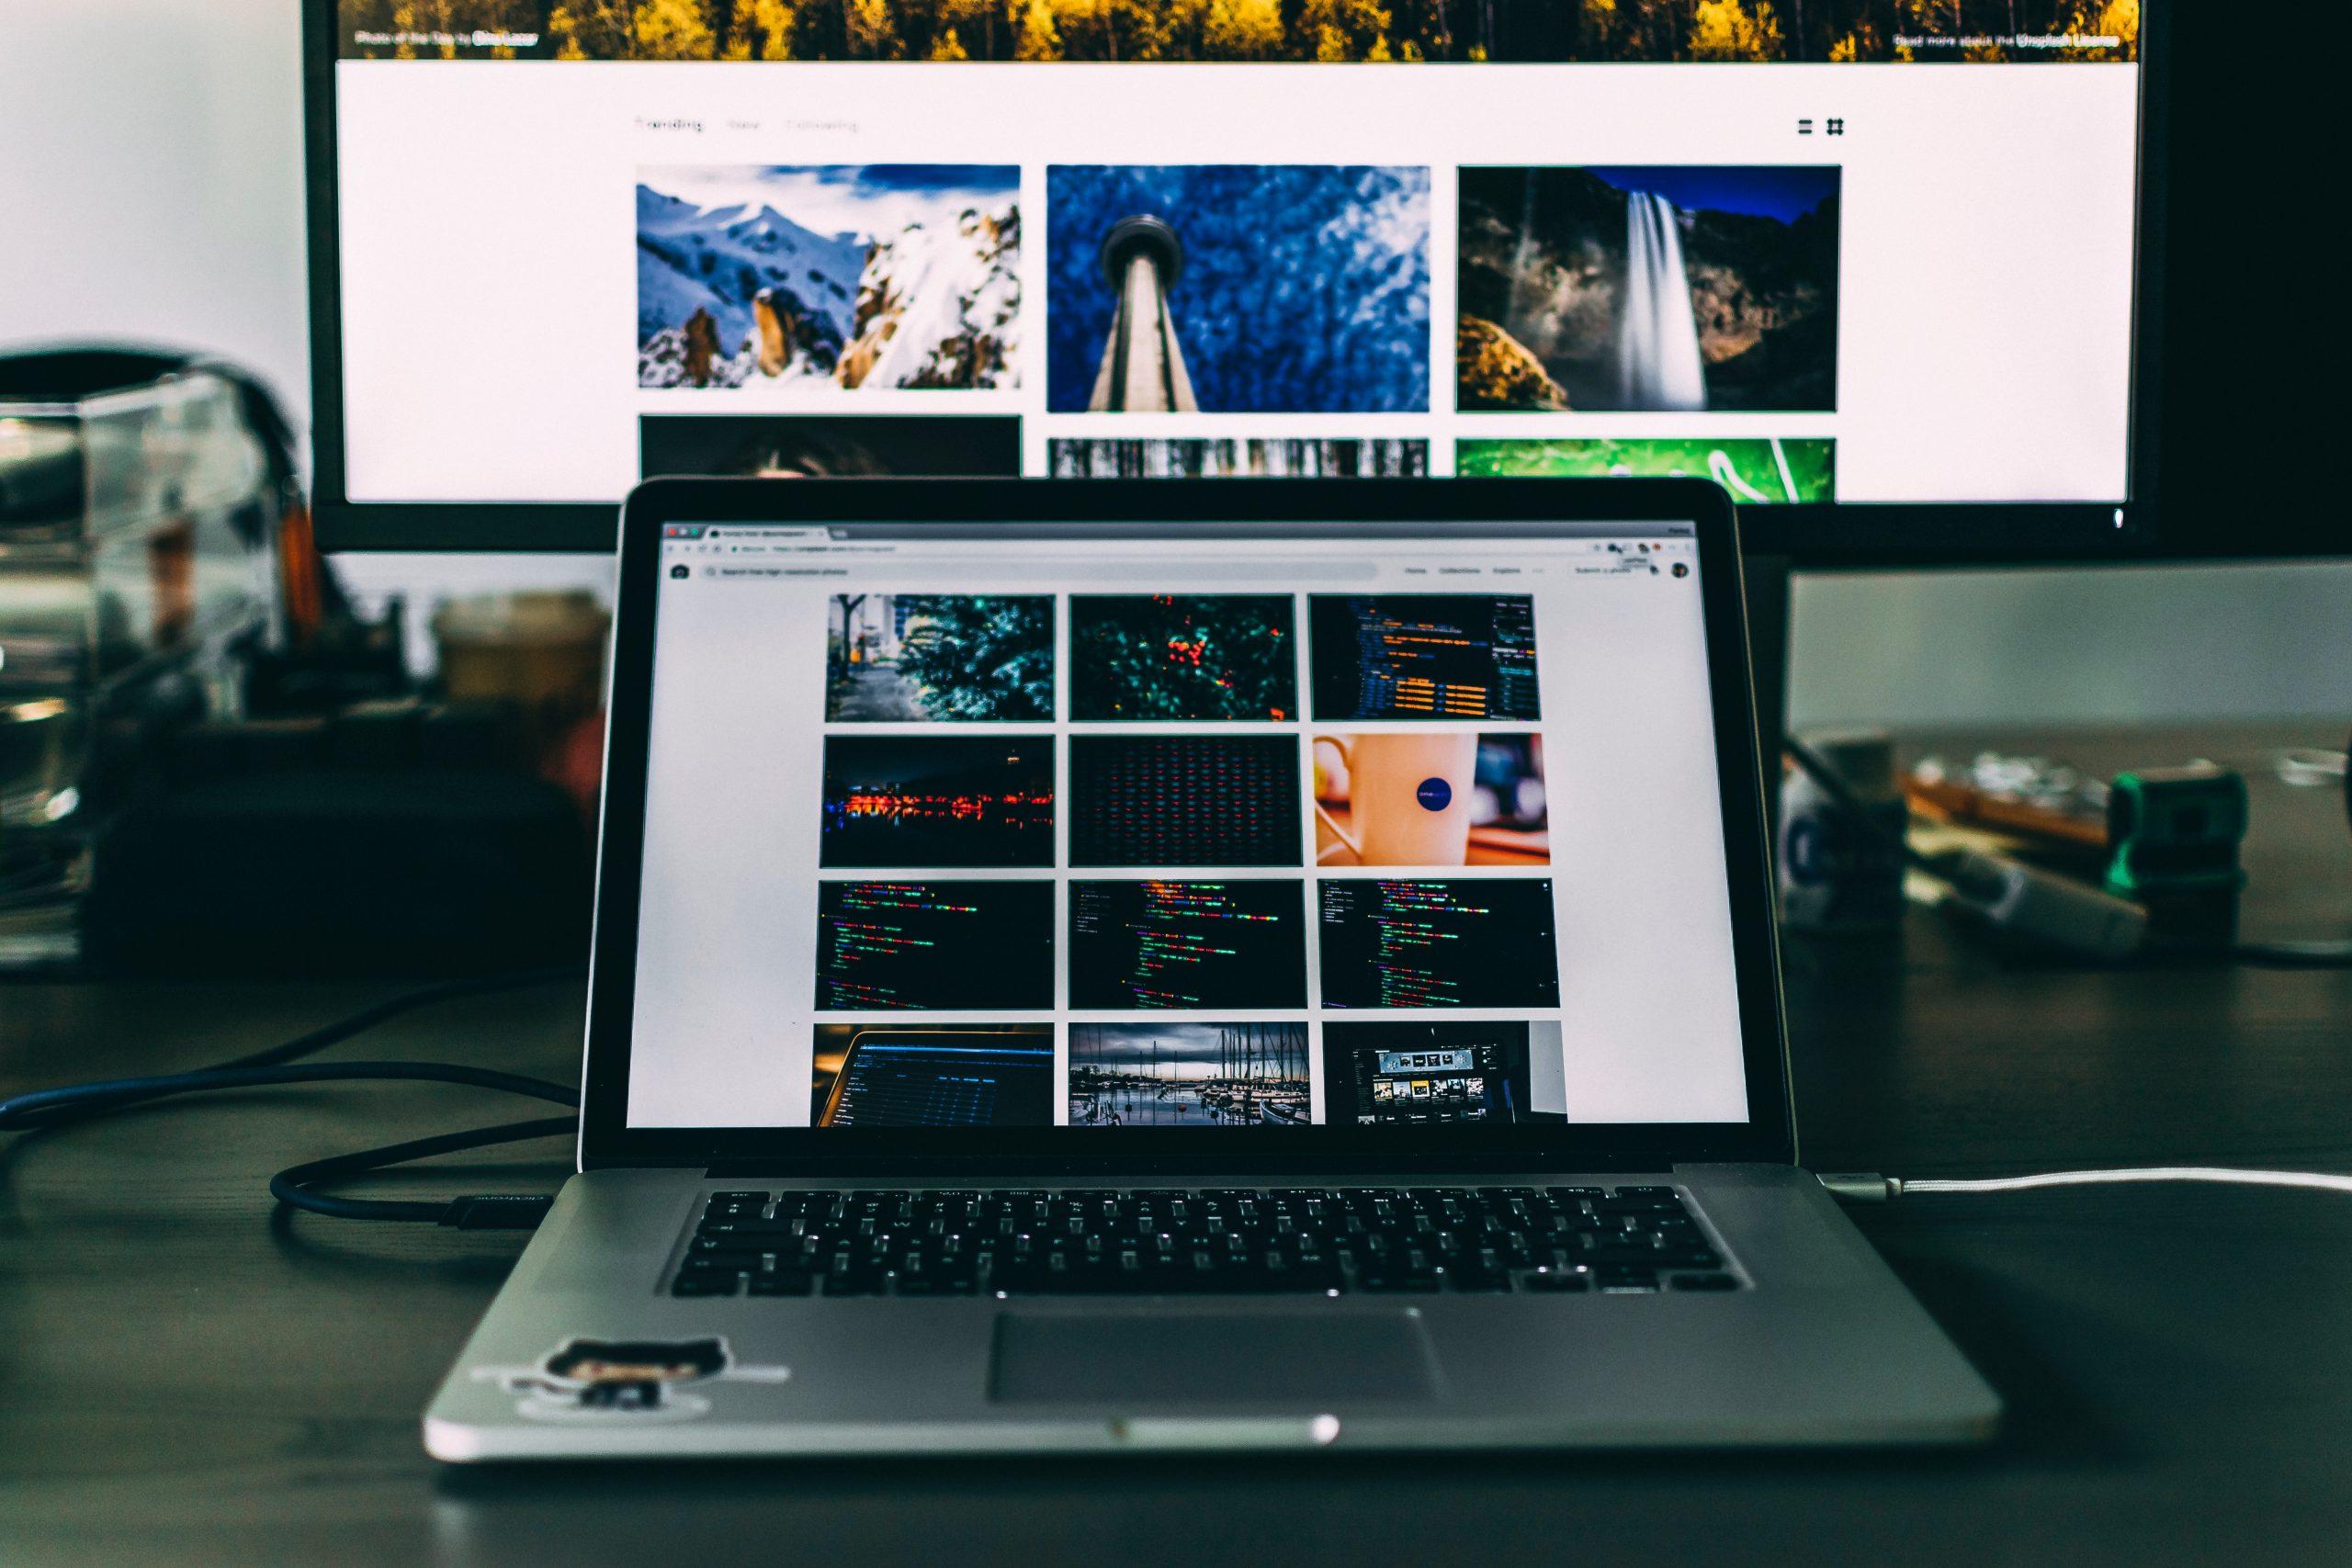 macbook_pro_2015_display_laptopvang.com